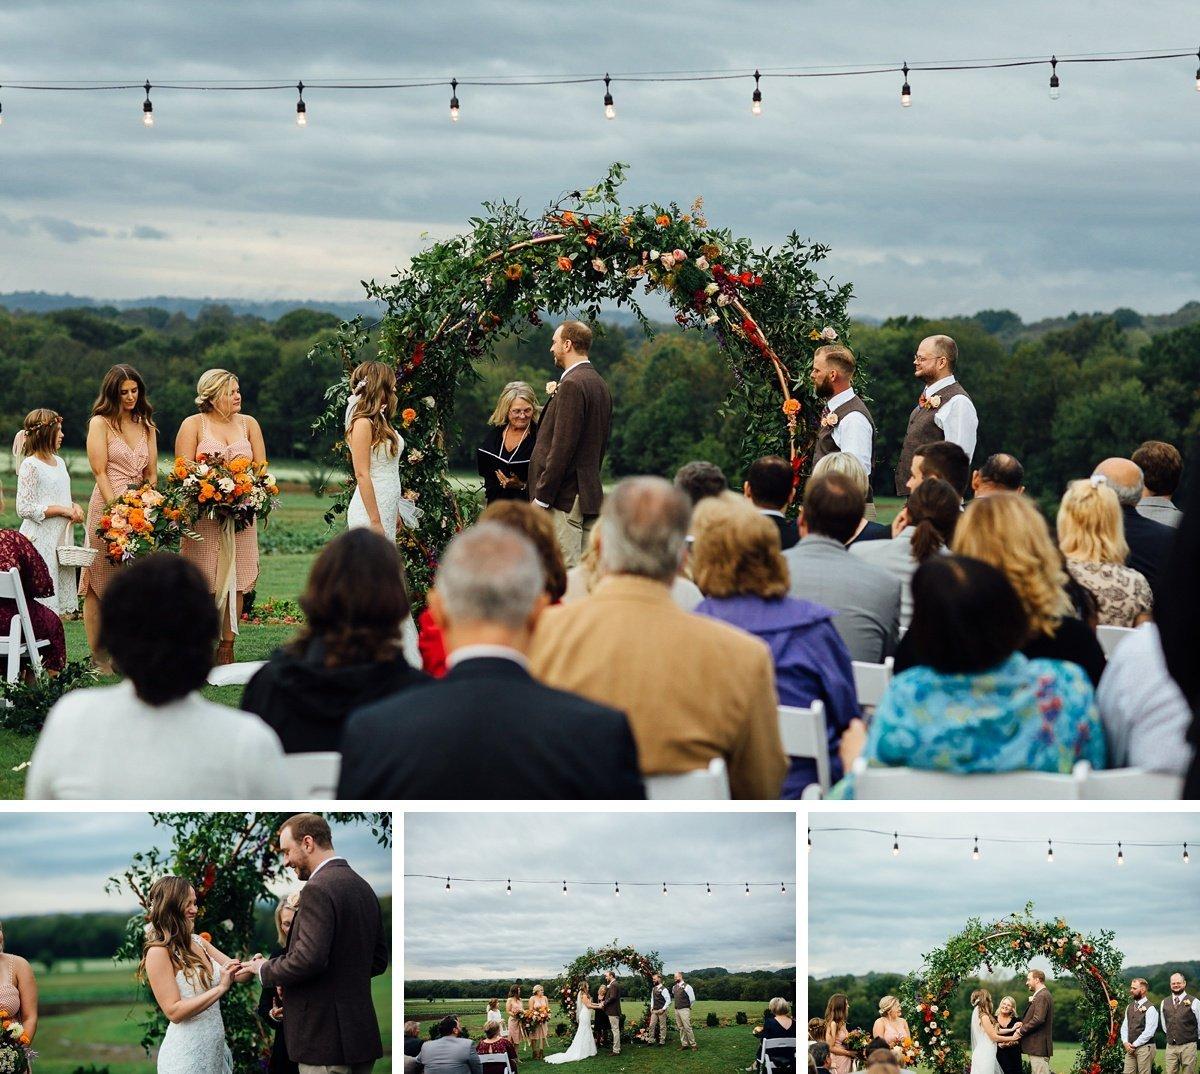 outdoor-wedding-tennessee Allenbrooke Farms | Spring Hill TN Wedding | Sam and Kaleb